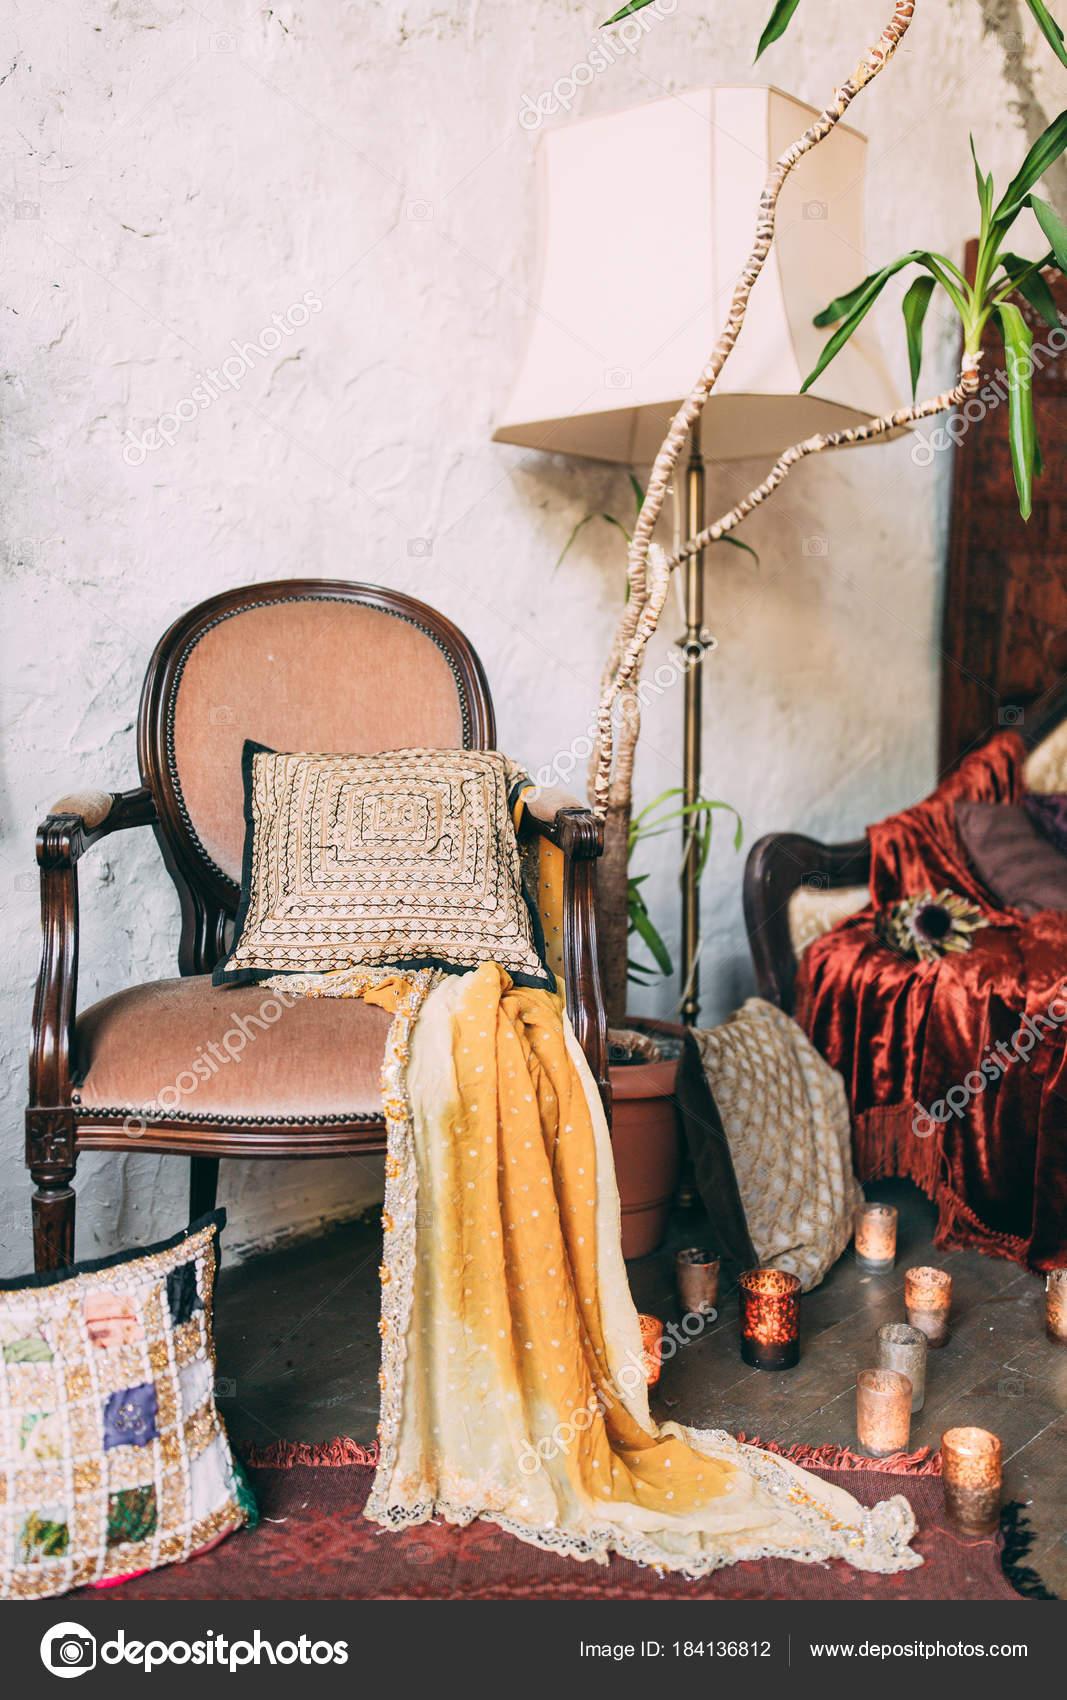 vaas plant stoel slaapkamer interieur stockfoto